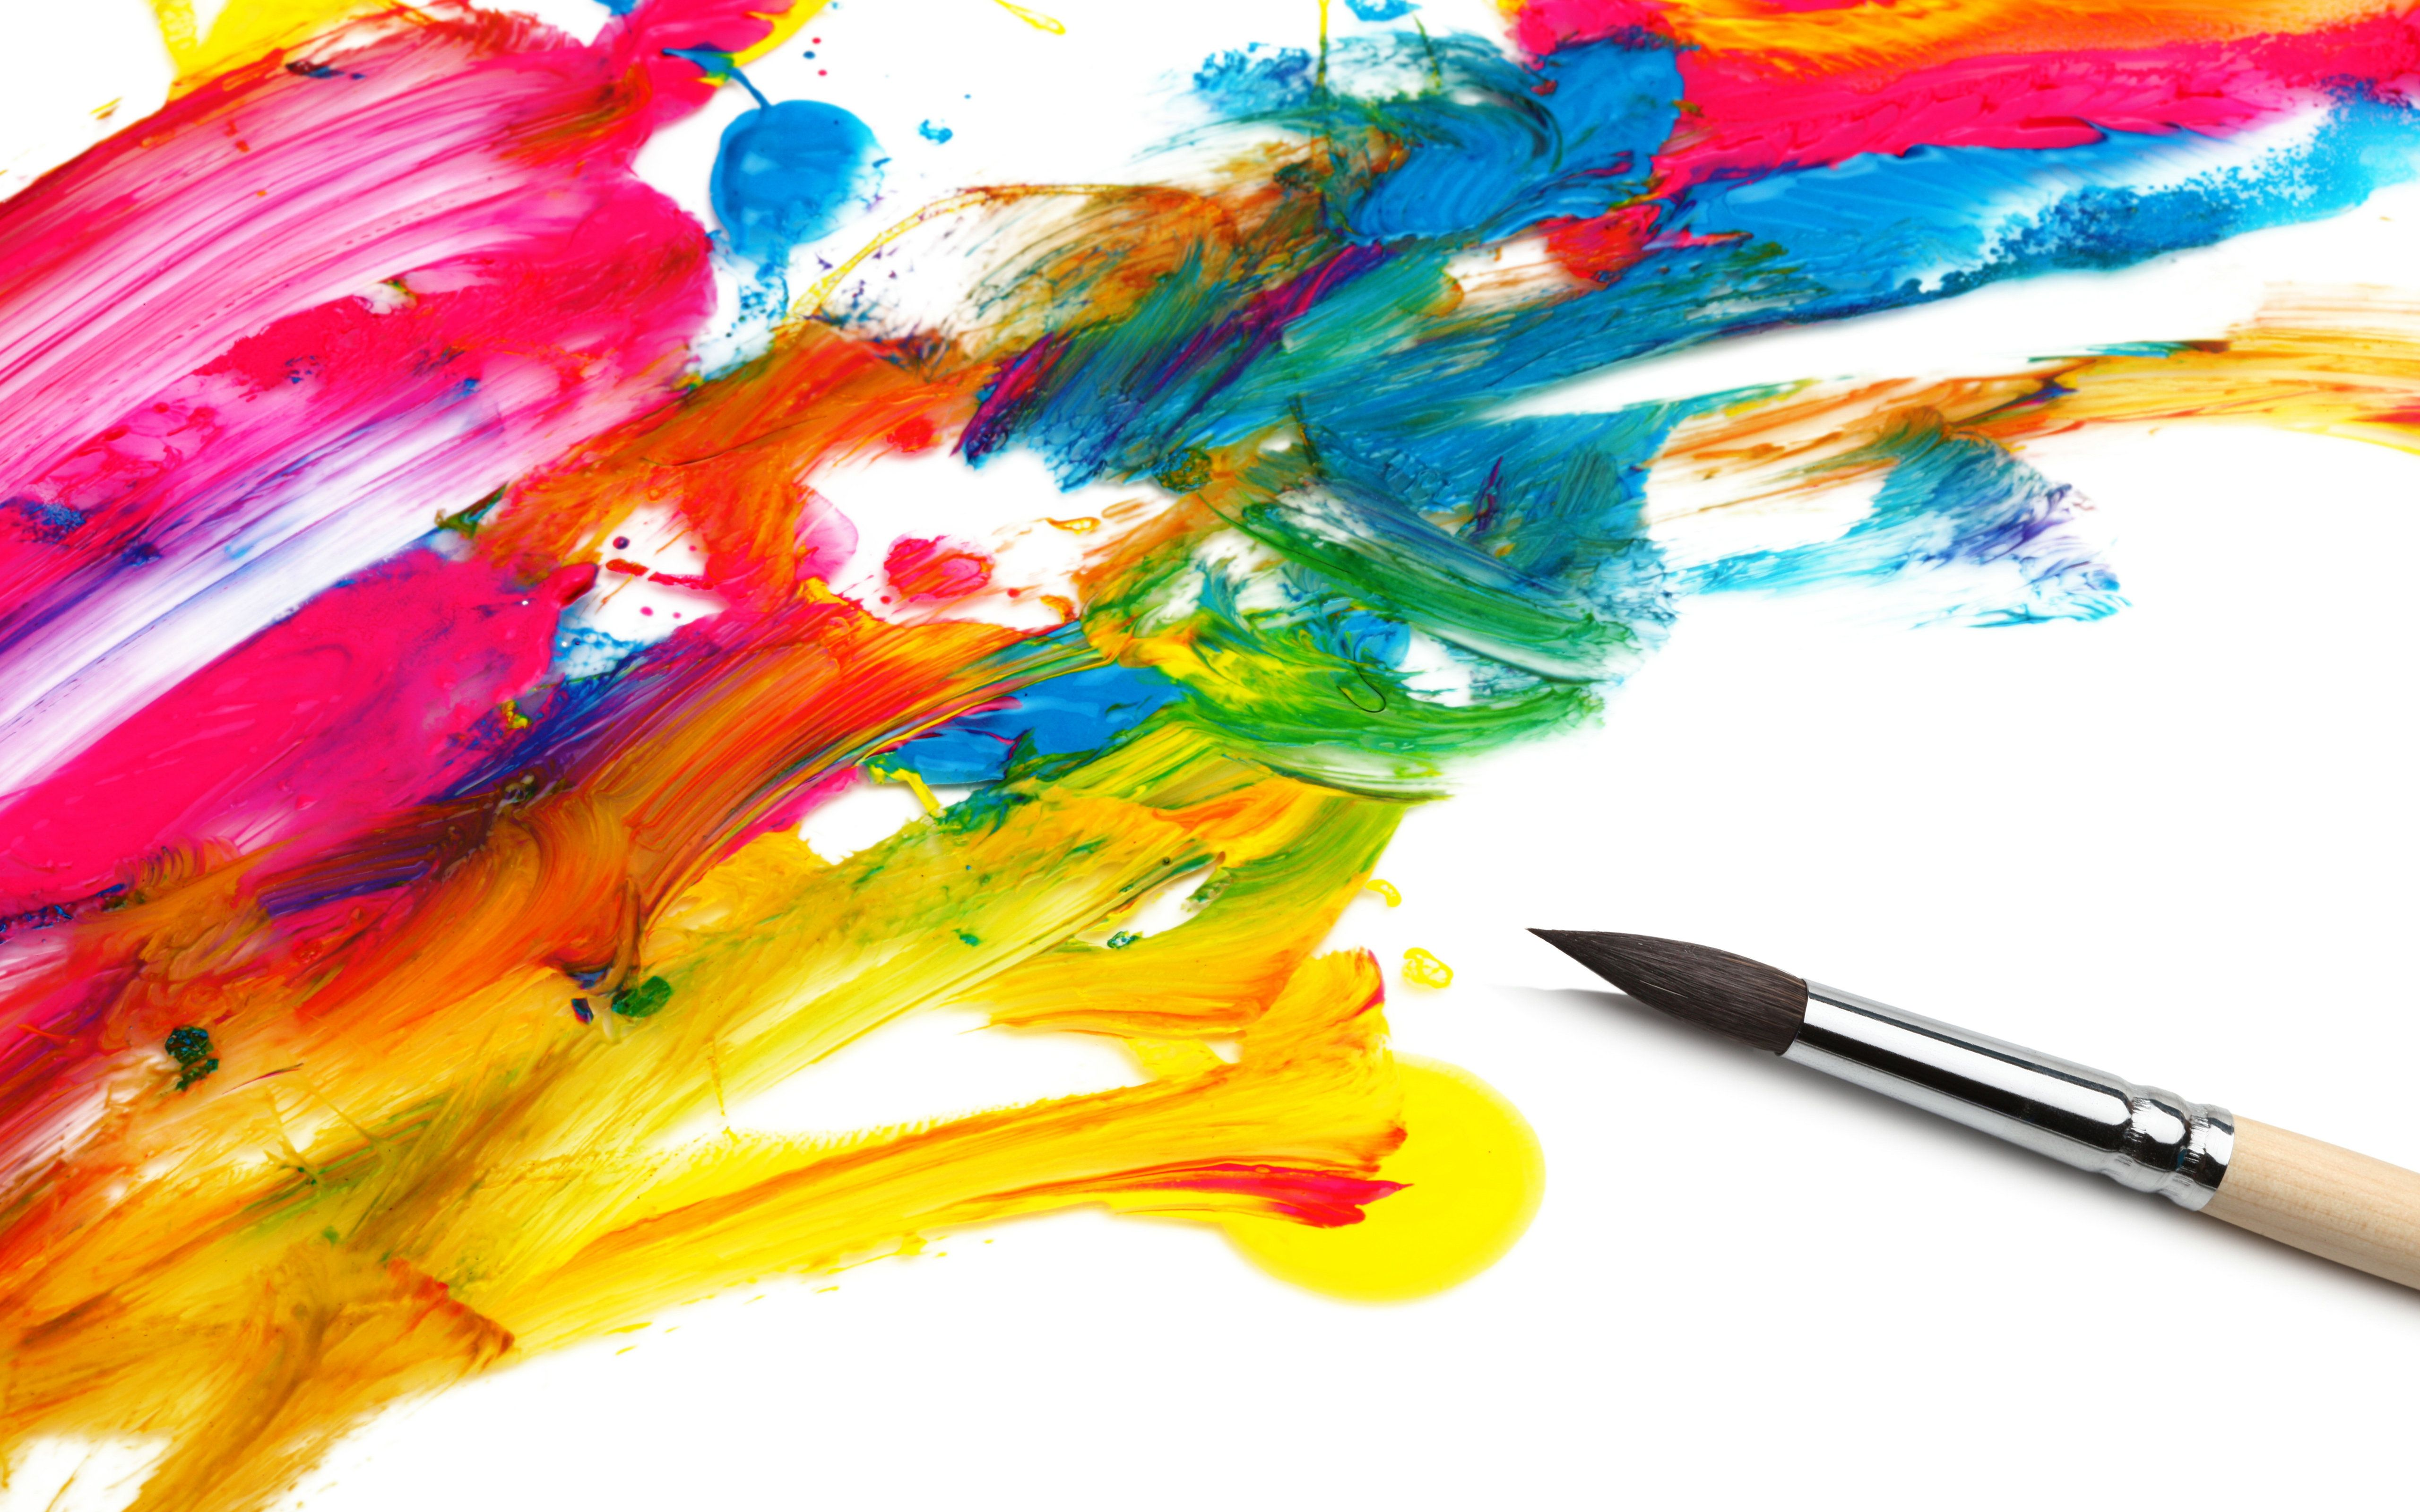 Color art dubai - Color Google Search